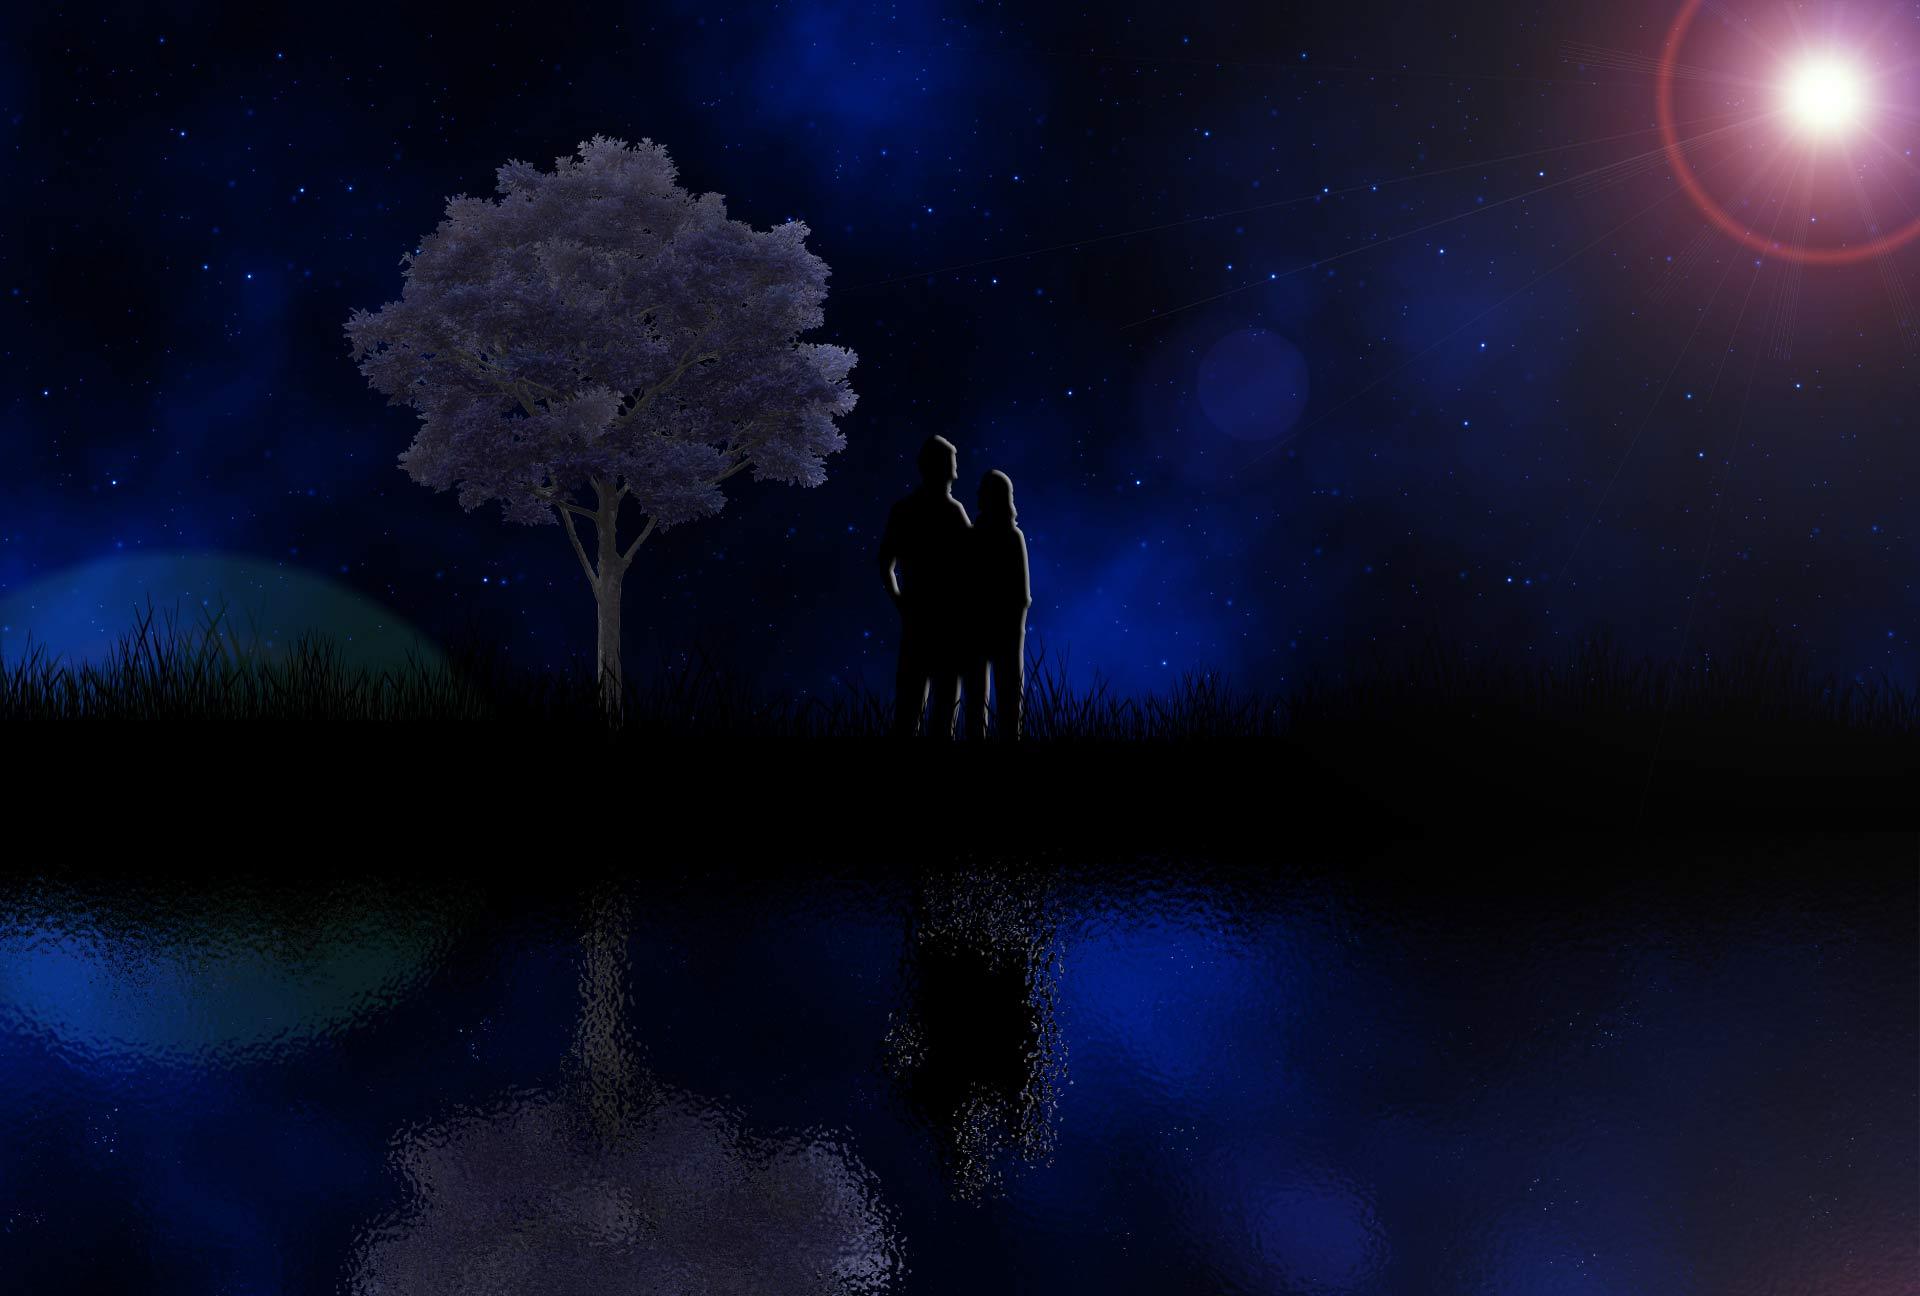 A Night For Lovers Fondo De Pantalla HD